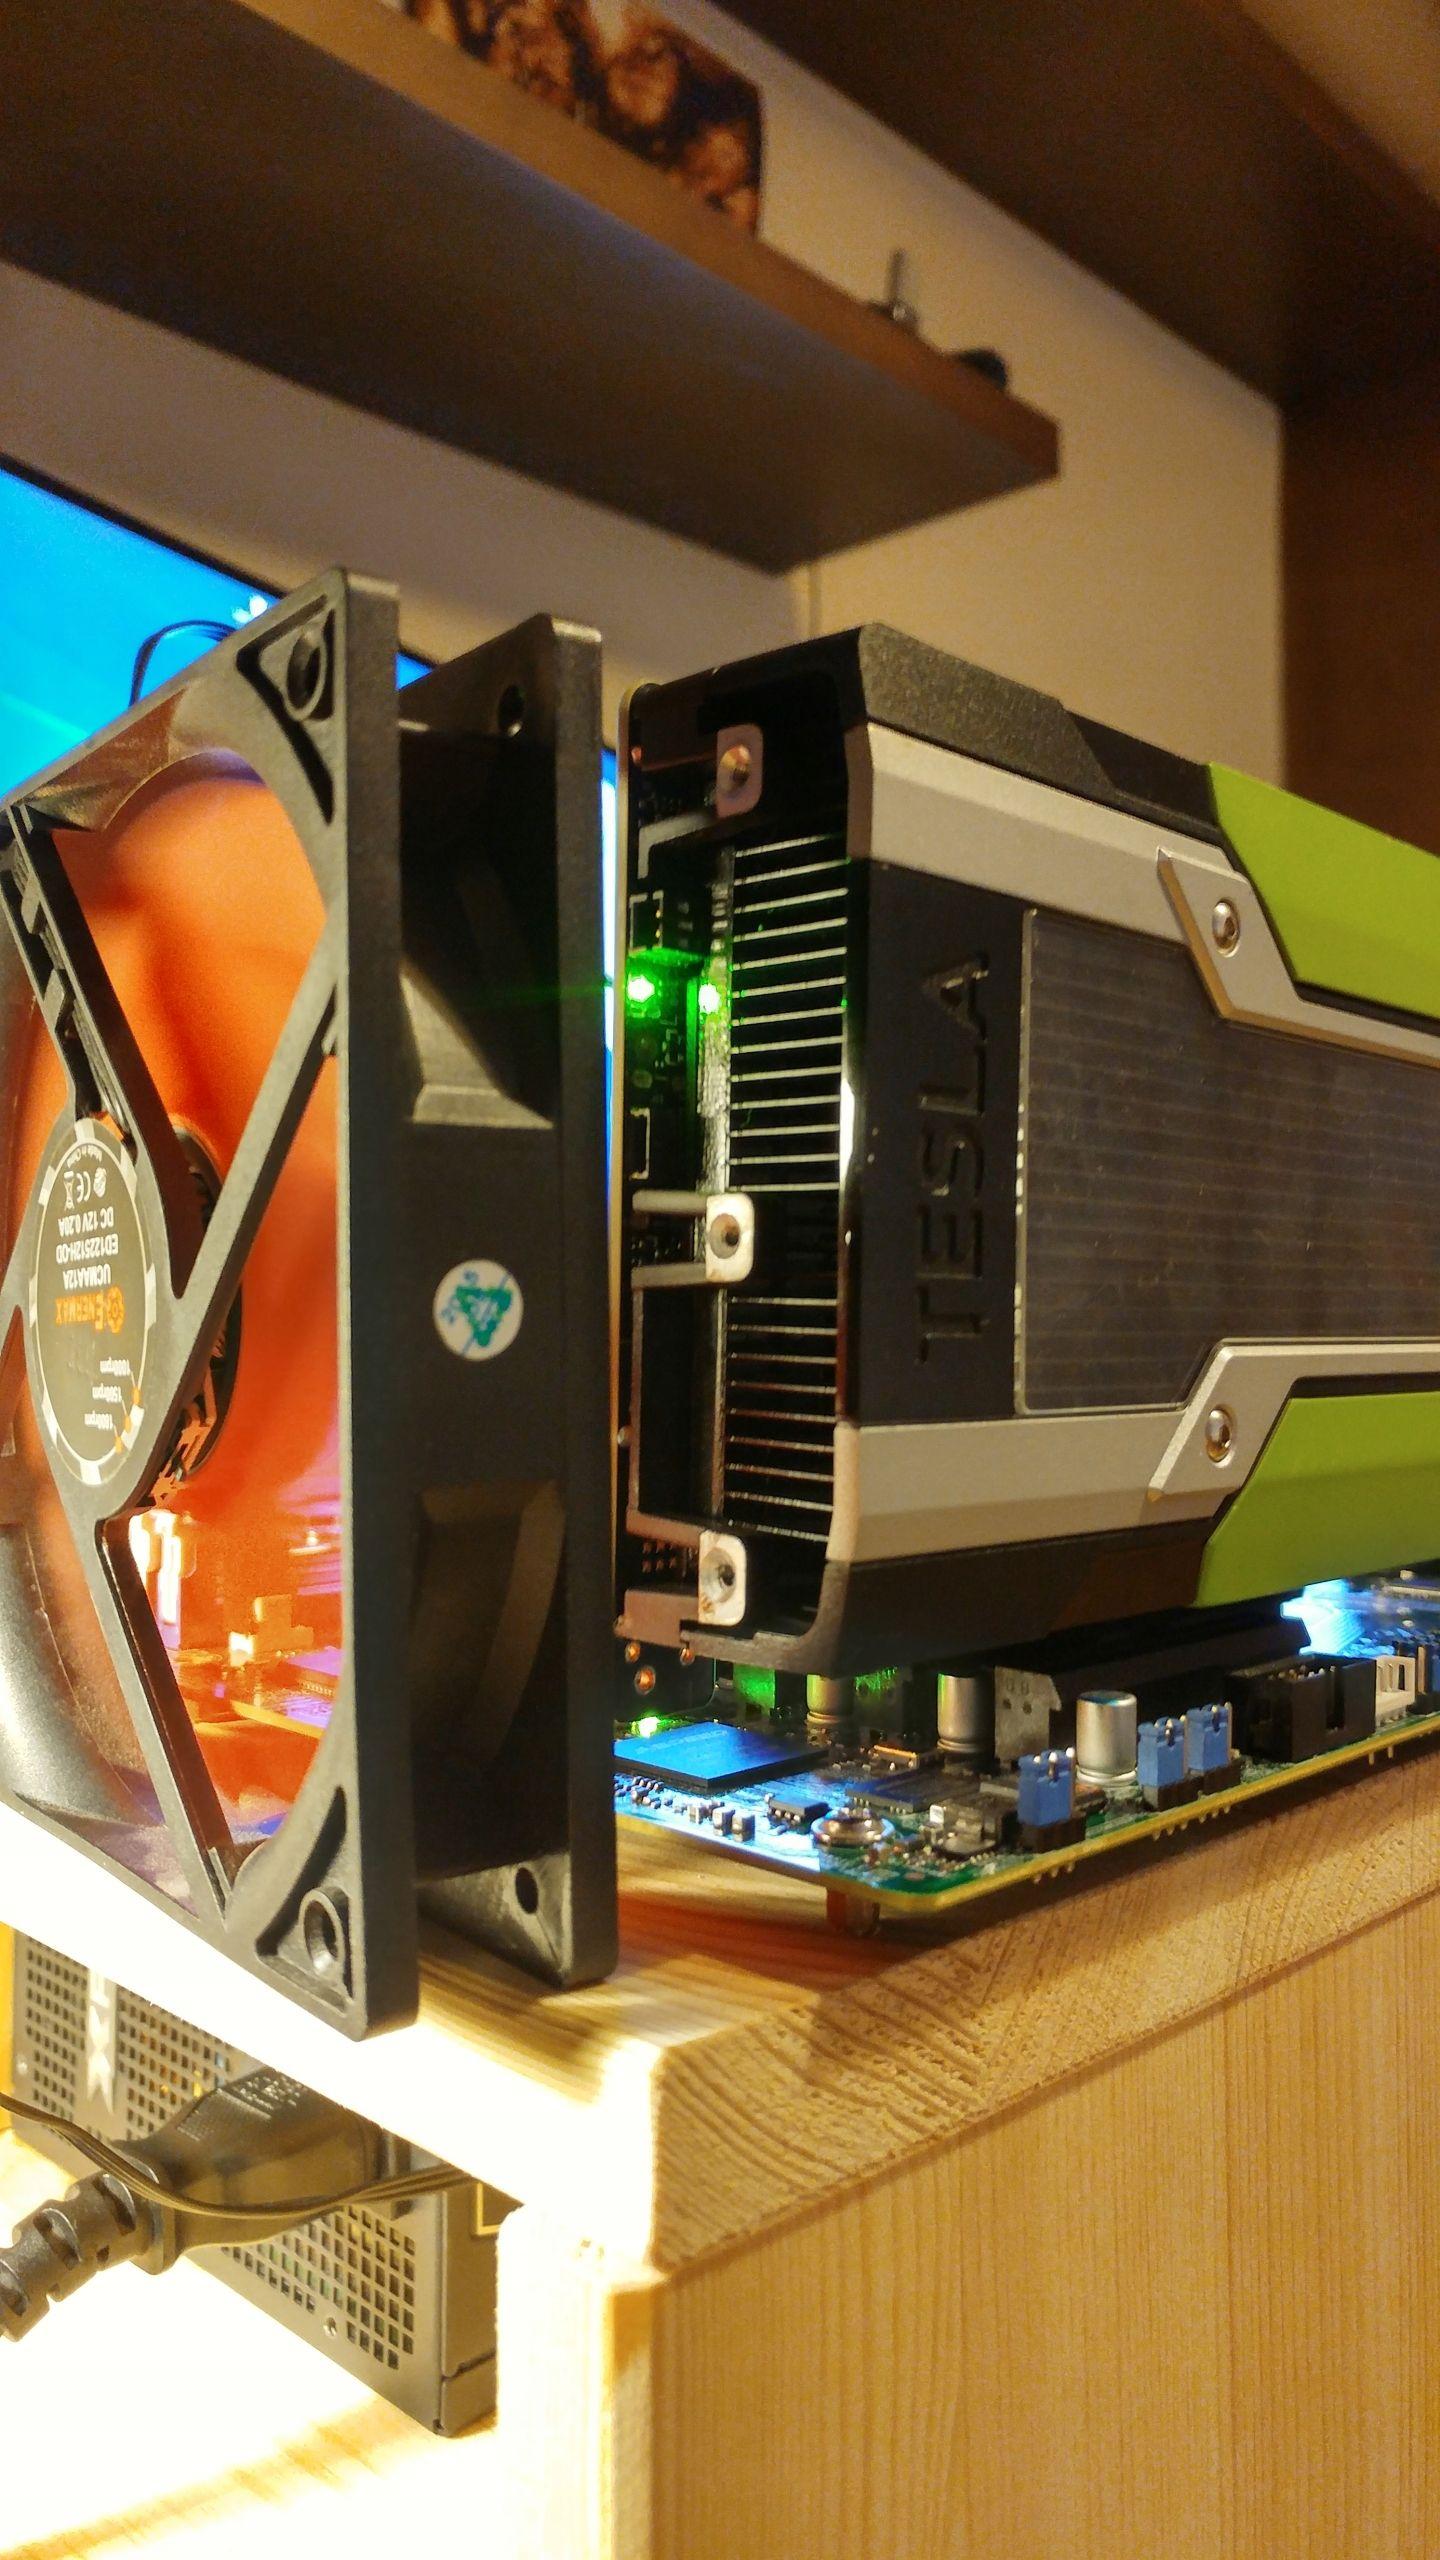 K80 allegro cg_baltek tesla nvidia 3d scanning